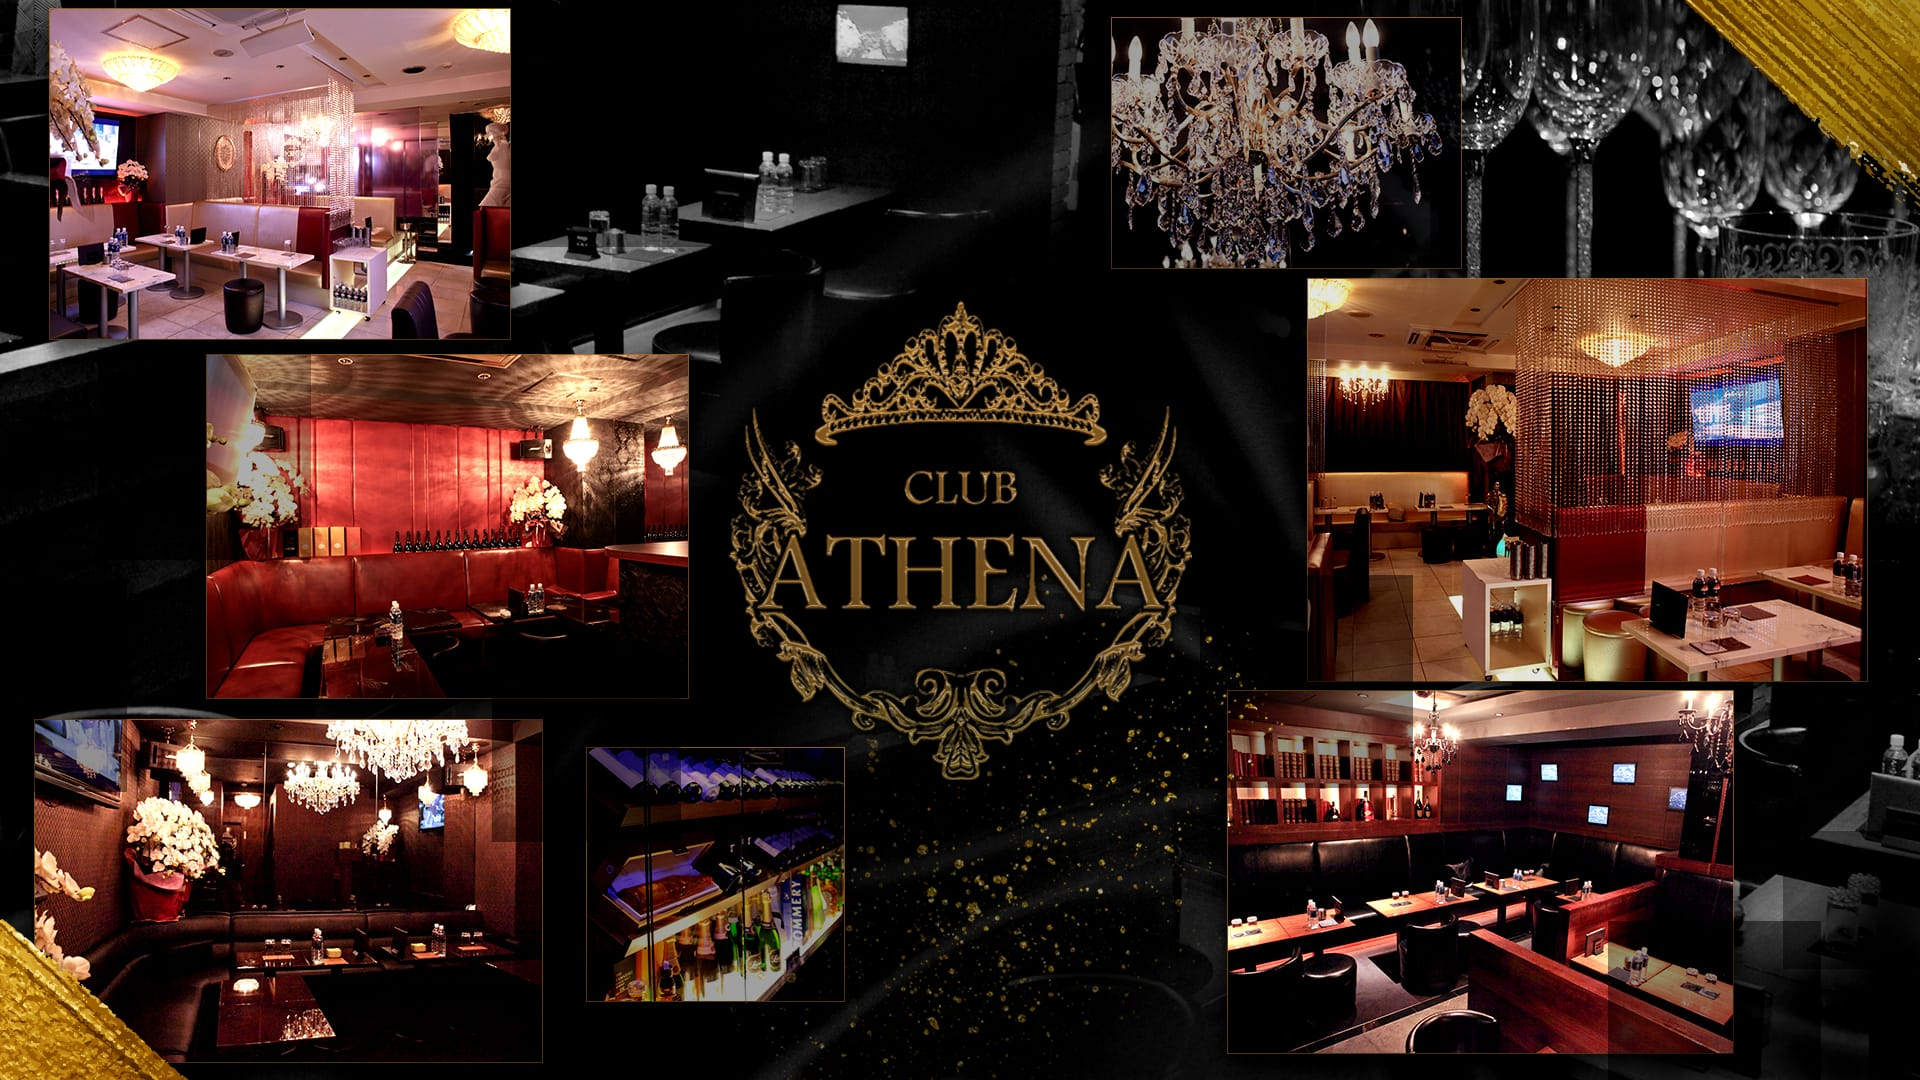 CLUB ATHENA(アテナ) 新橋キャバクラ TOP画像